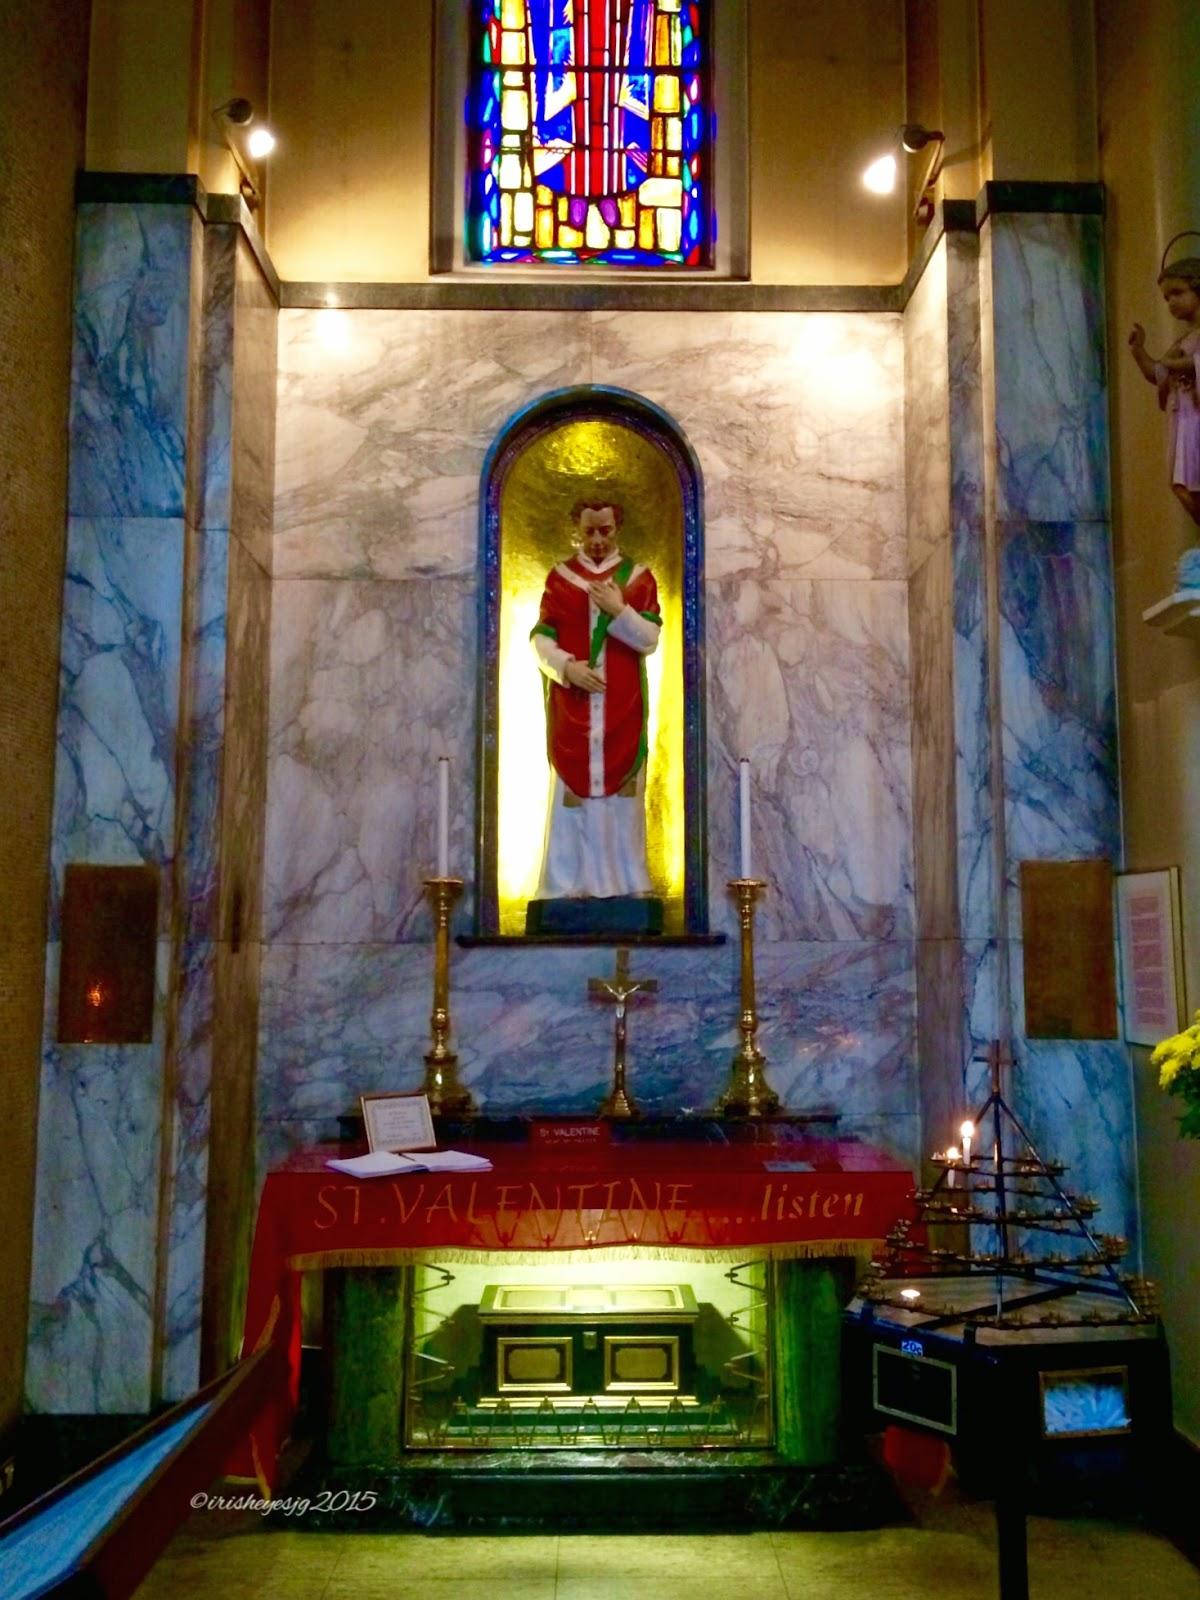 St. Valentine In Dublin